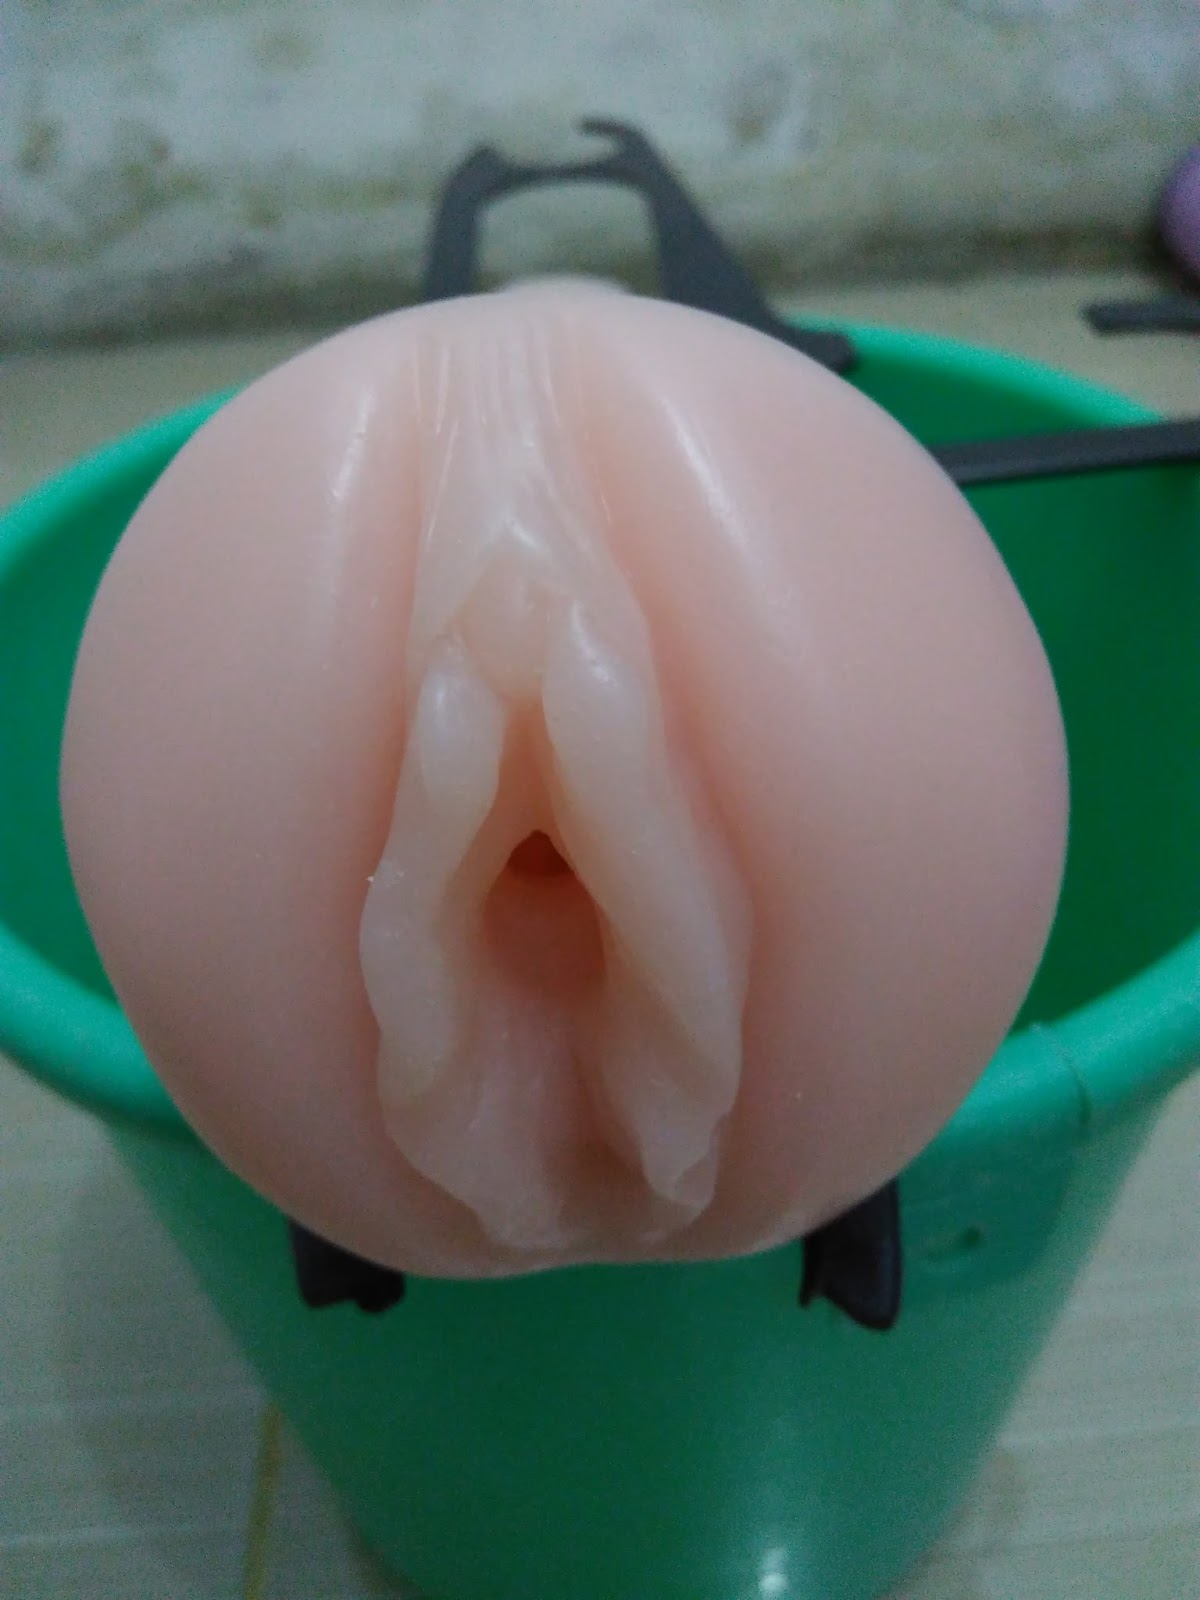 Frosid Shop Vibrator Kapsul Penggetar Vagina Penggeli Remot Tanpa Kabel Alat Bantu Sex Wanita Pemakain Baru 4 Bulan Masih Bagus Dan Bersih Karna Selalu Dirawat Dibersihkan Pakai Shampoo Untuk Bayi Detail Produk